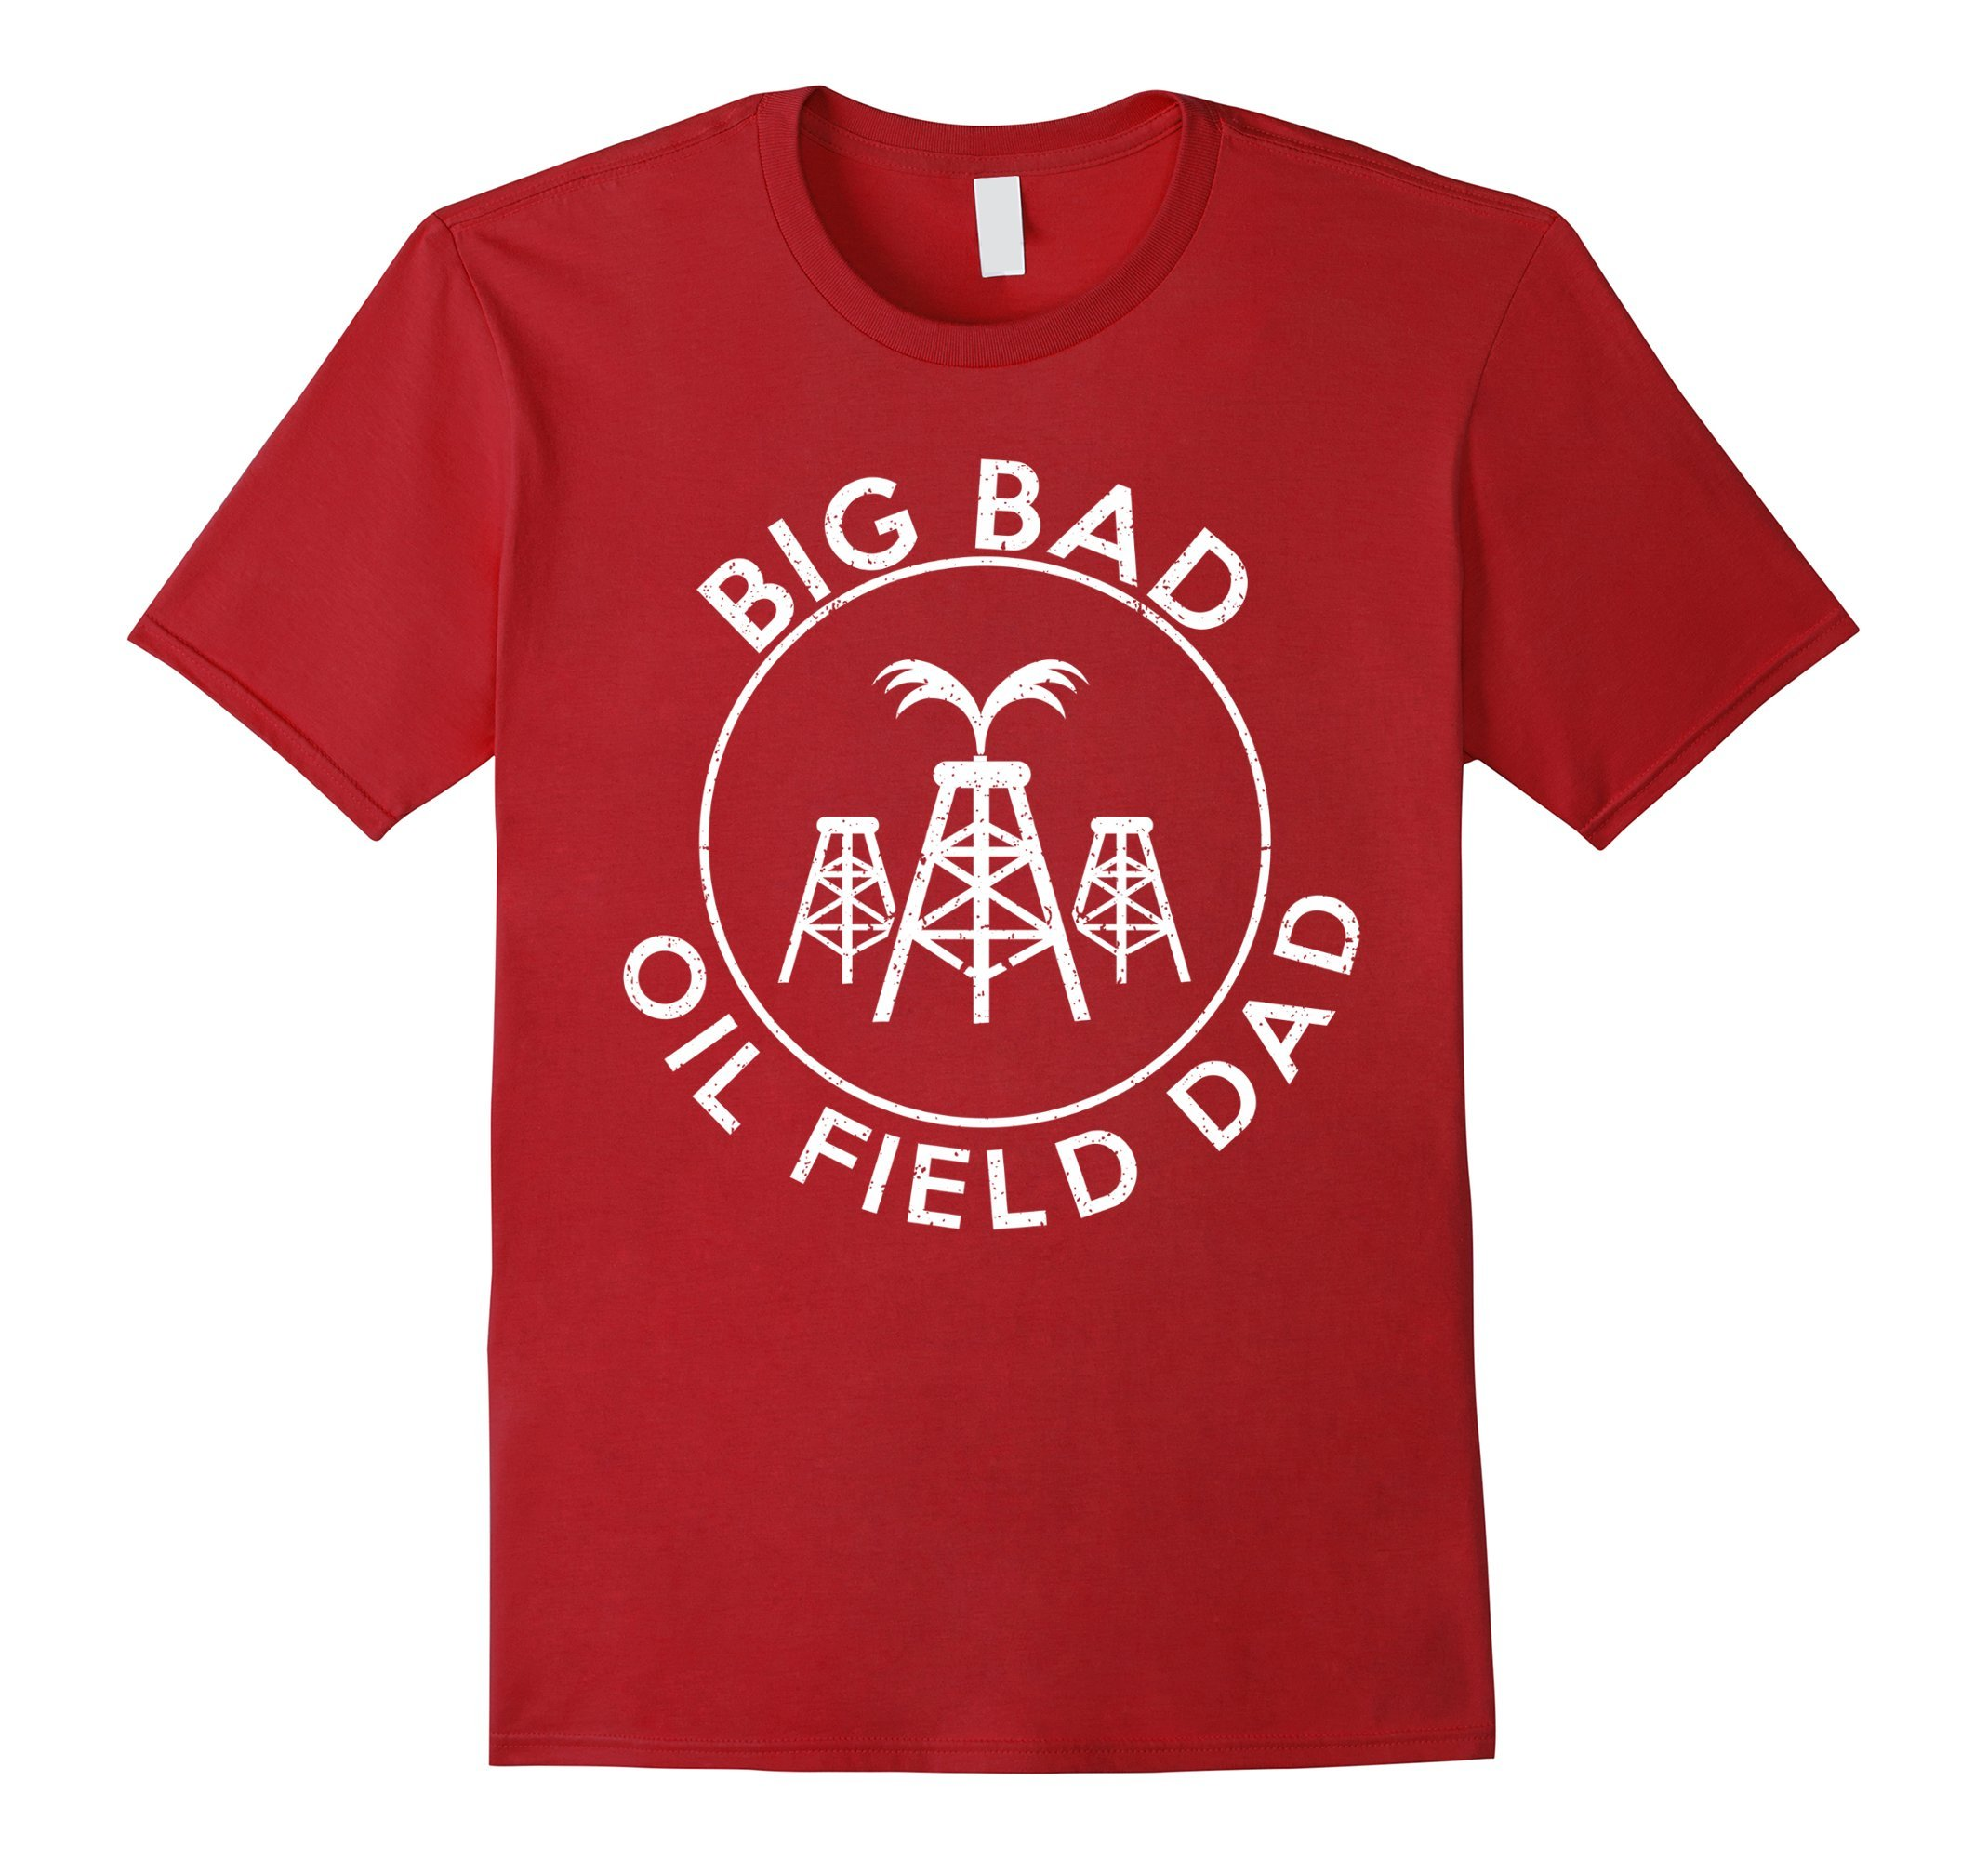 big bad oilfield dad oilfield t shirt oilfield gifts